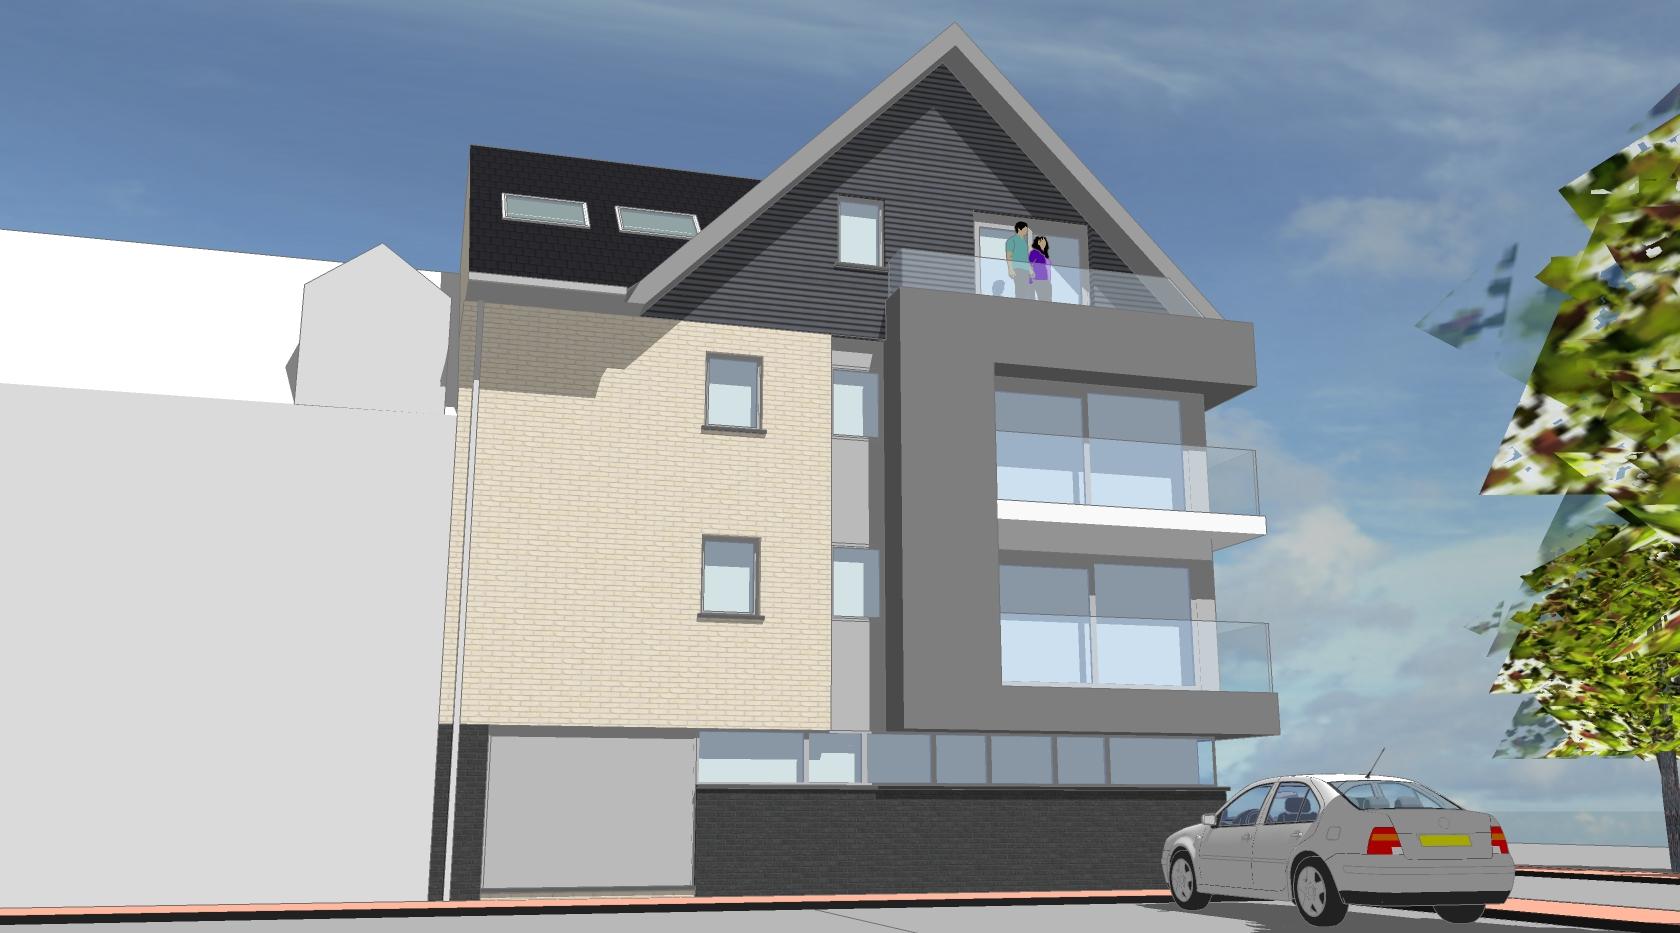 3D model Beuselinck zwarte dakpan 03.jpg